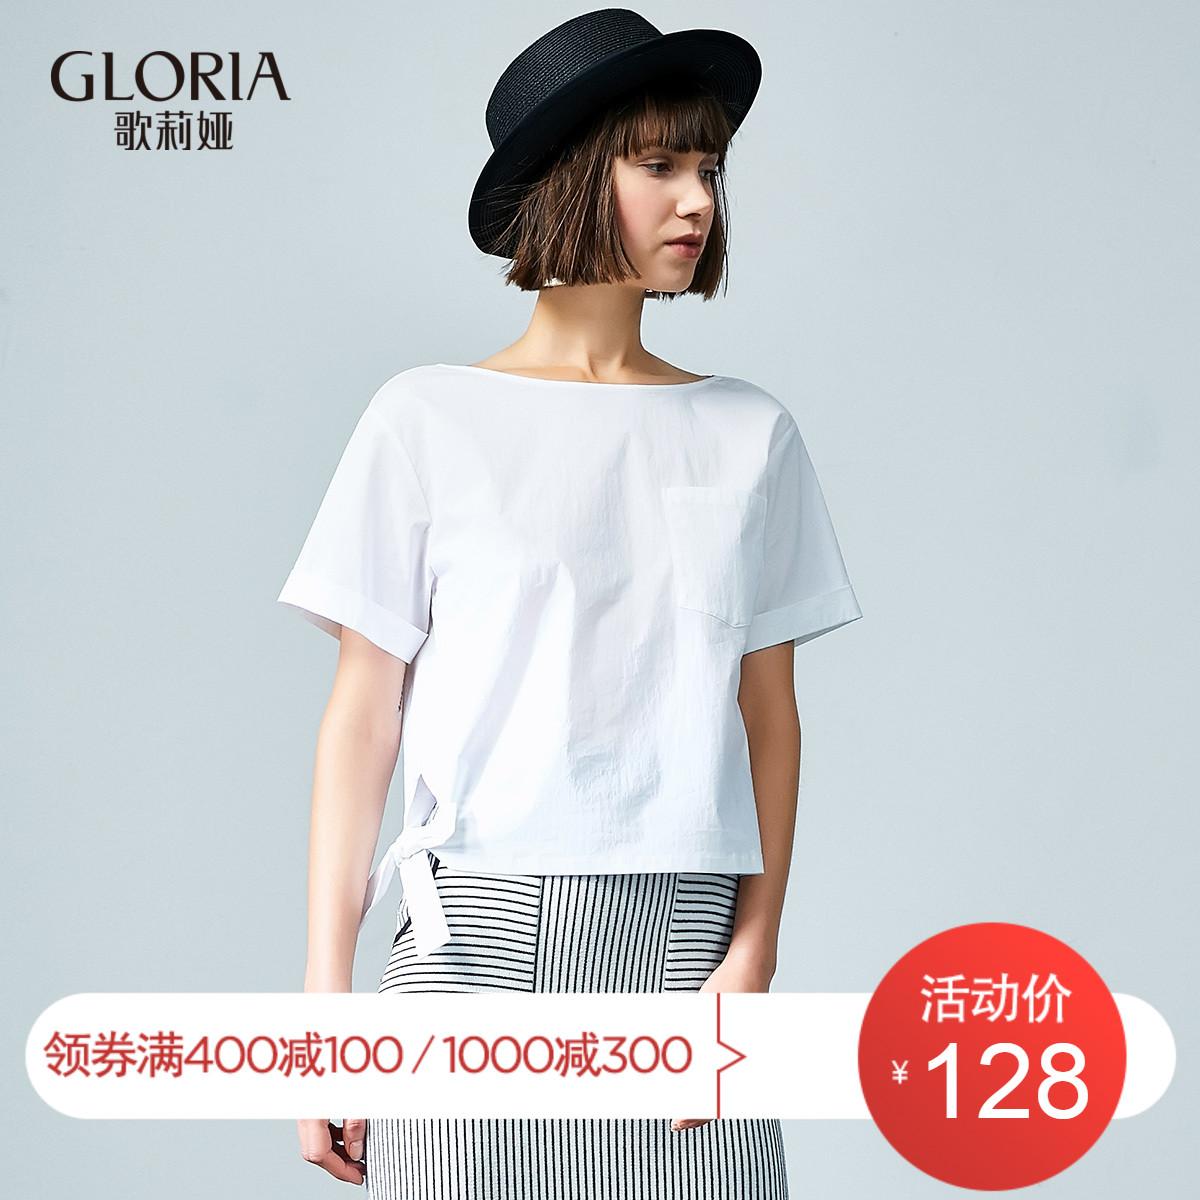 GLORIA-歌莉娅女装2018秋季腰部系带上衣187J3B110